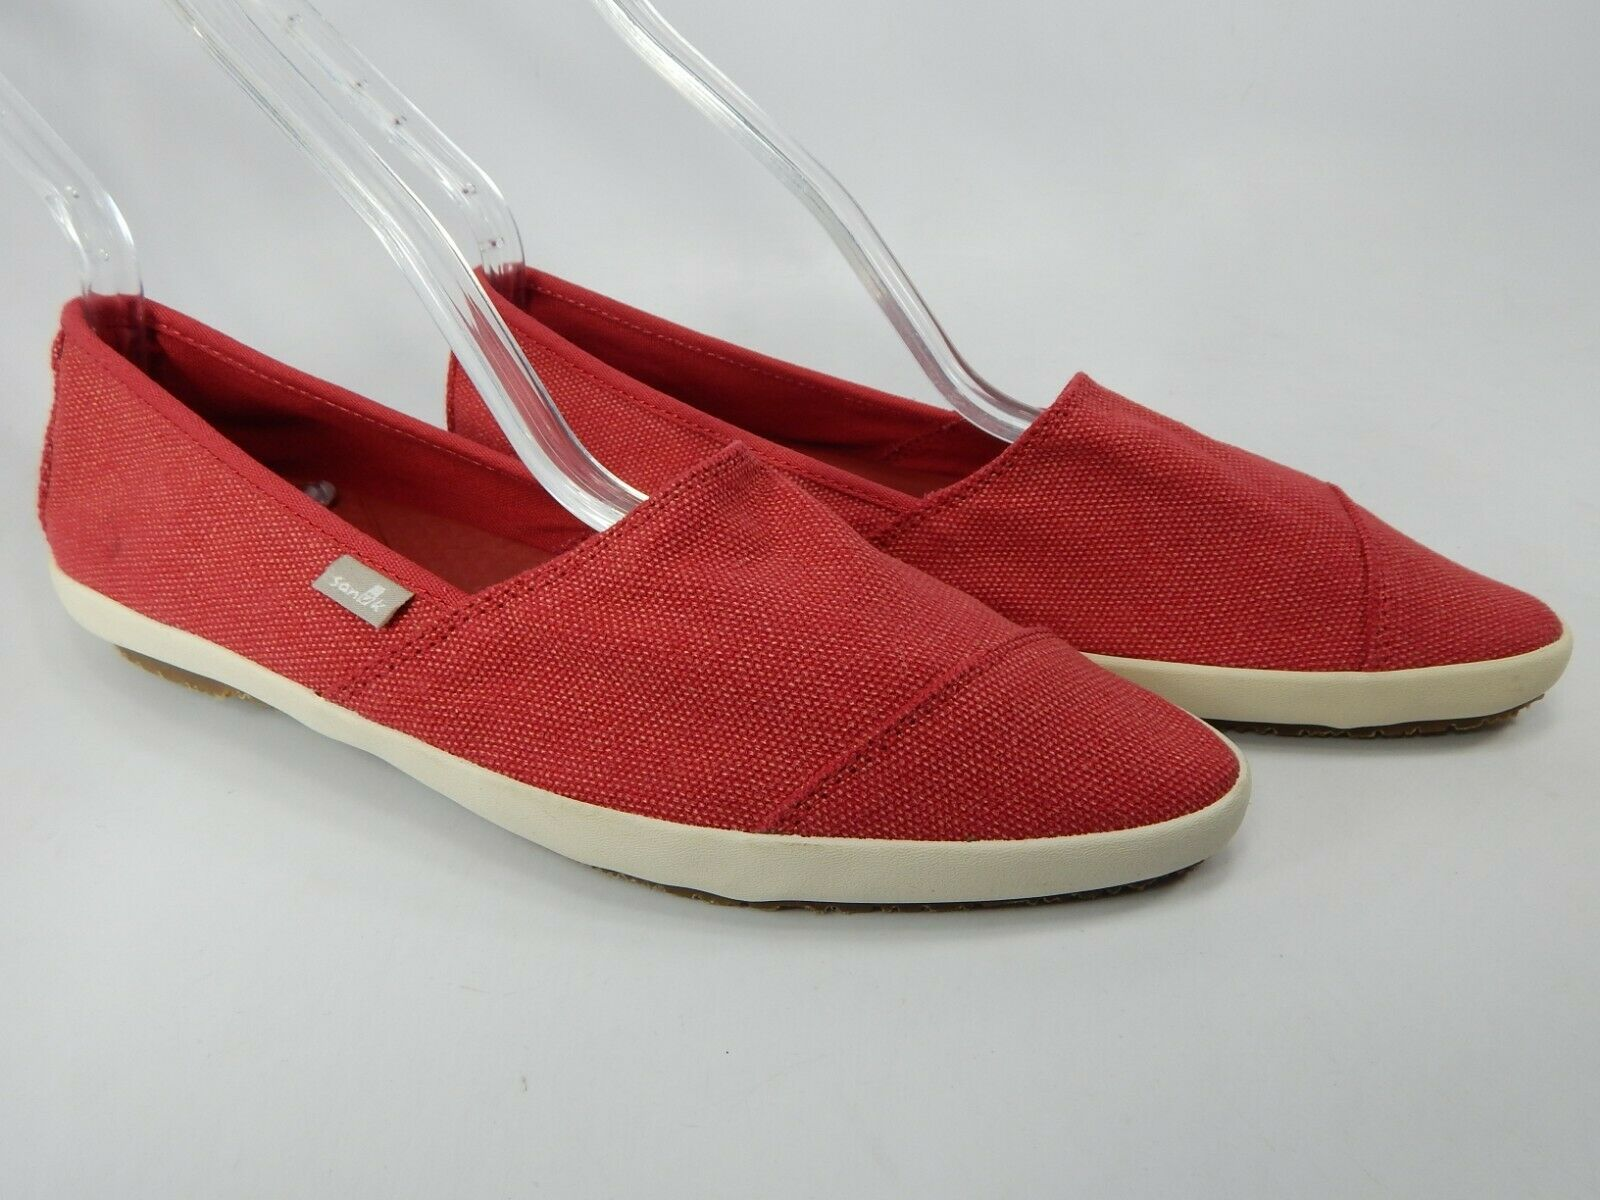 Sanuk Kats Meow Size US 7 M (B) Women's Pointed Toe Flats shoes Red